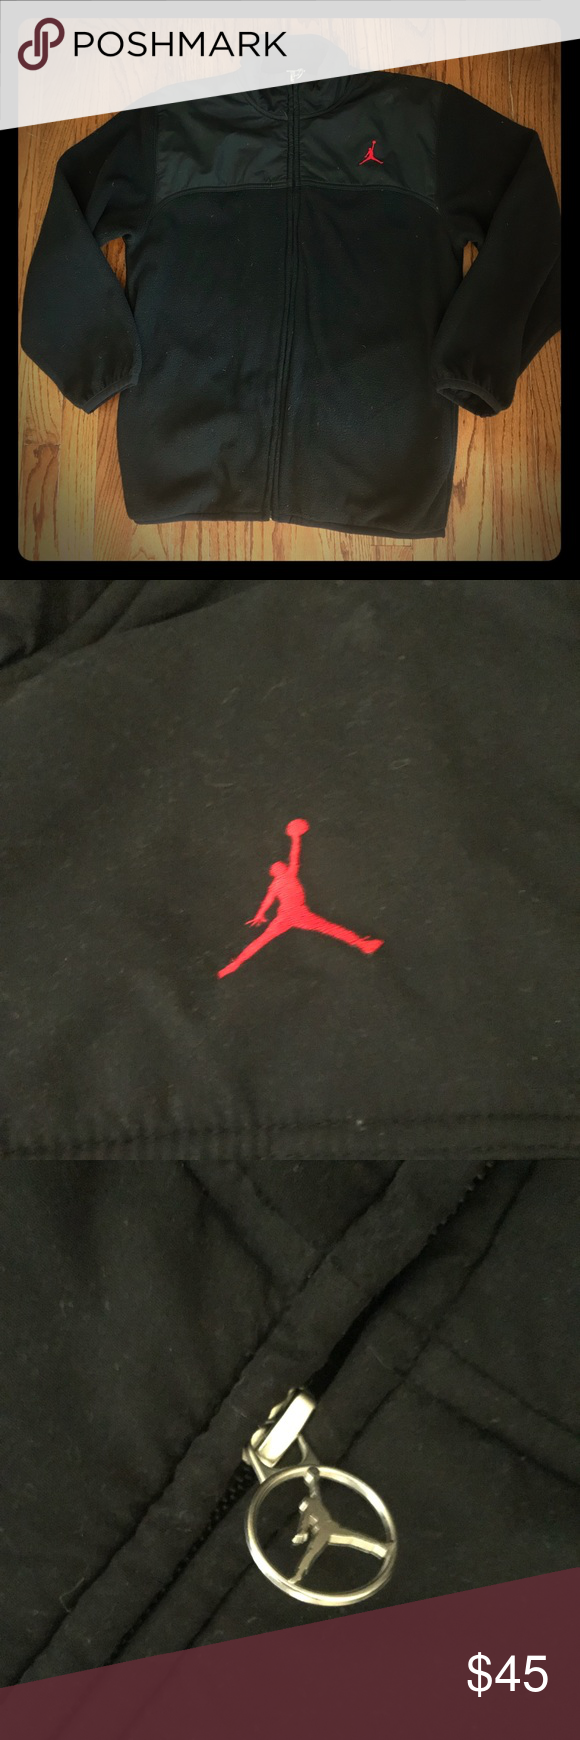 cfaac8fca74b Nike Jordan Jumpman Fleece Jacket Sz L